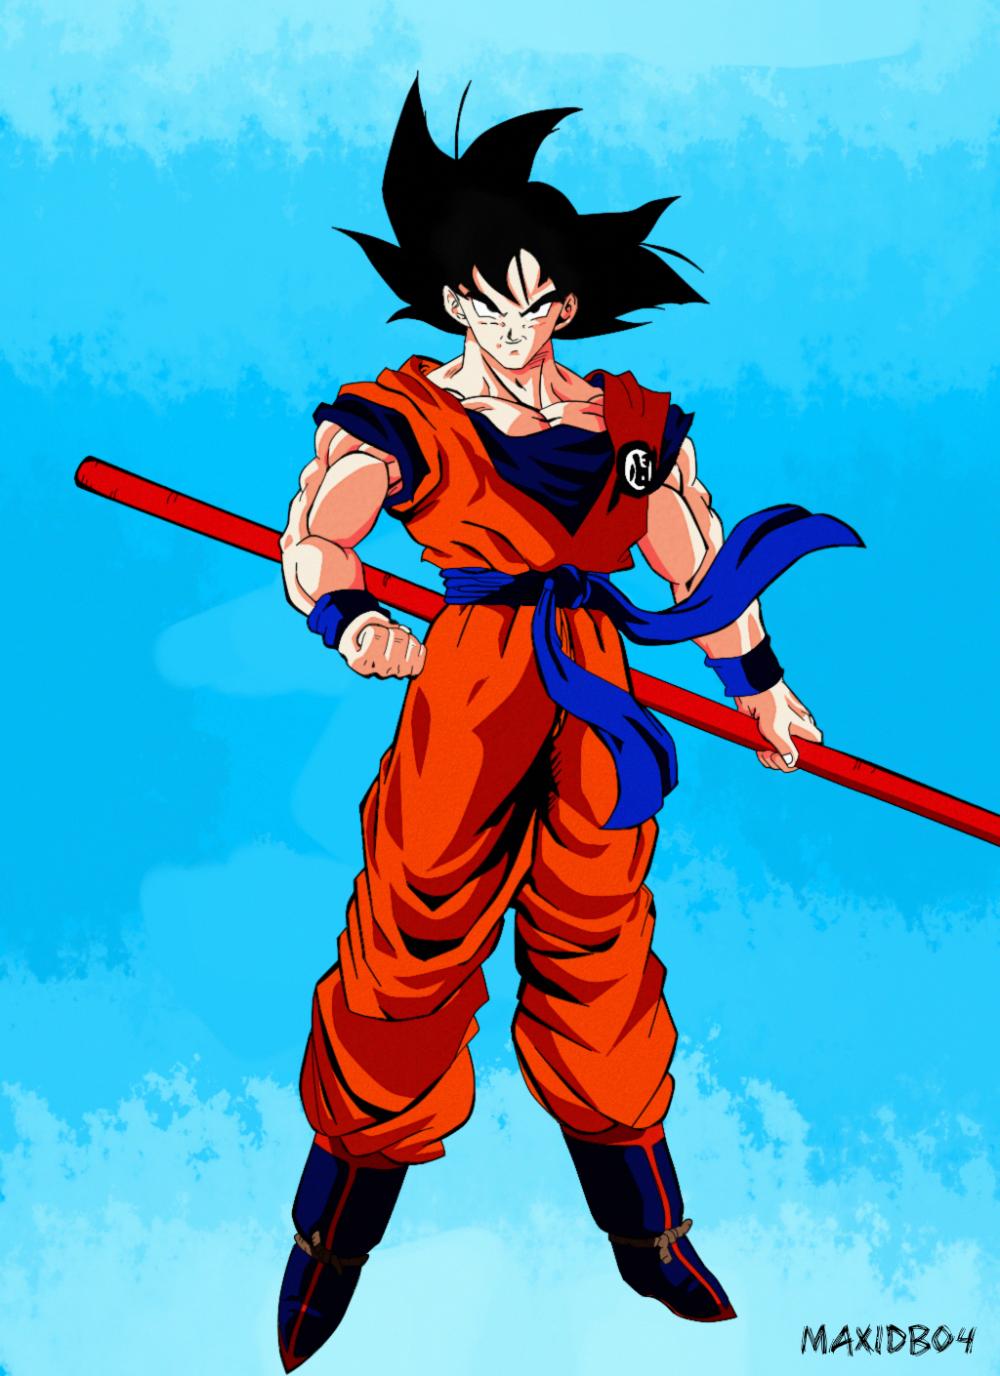 90 S Style Dragon Ball Z Attempt 2 Dbz Dragon Ball Super Goku Dragon Ball Image Dragon Ball Z